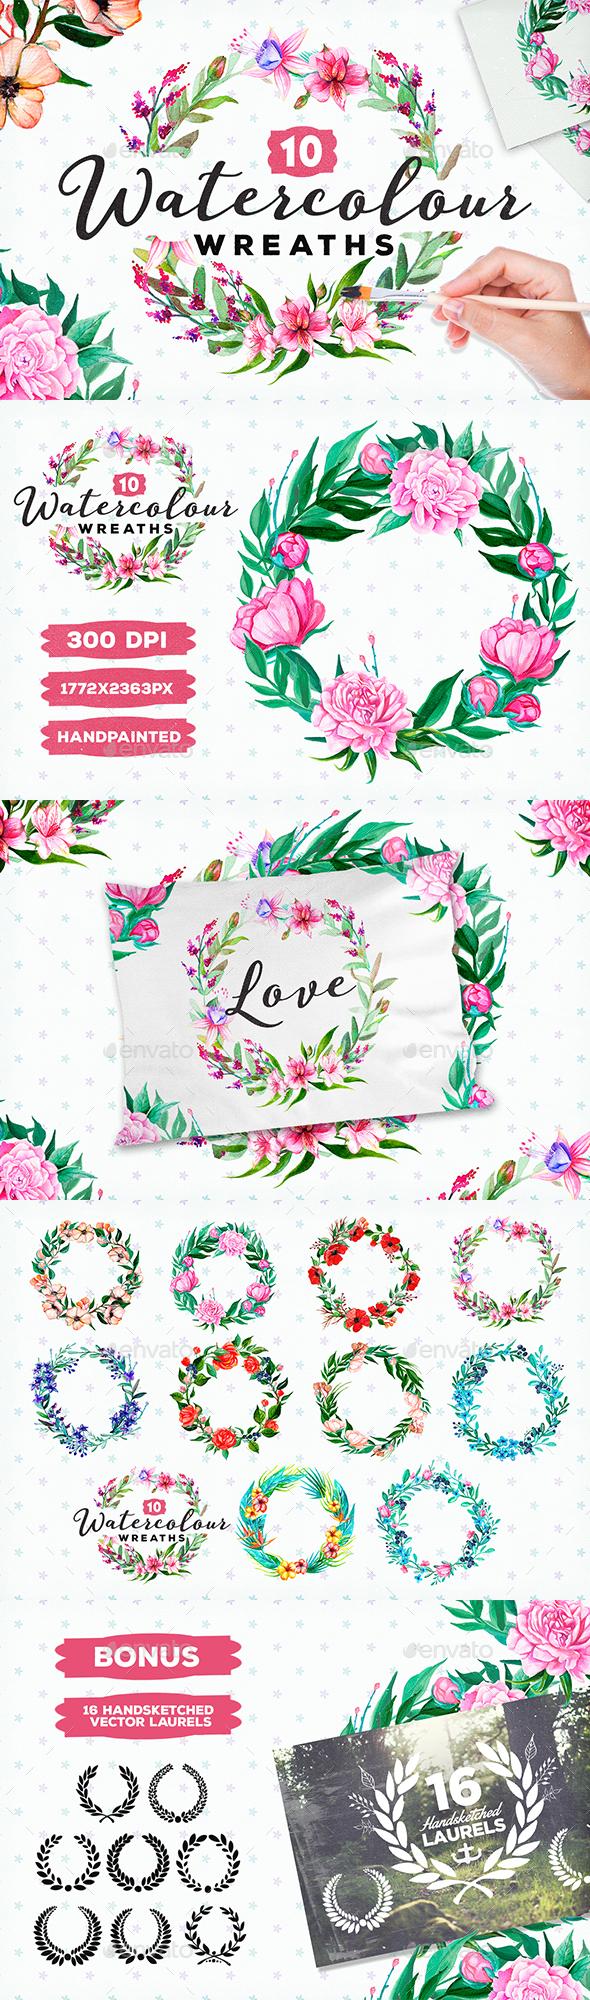 10 Handpainted Watercolour Wreaths - Flourishes / Swirls Decorative